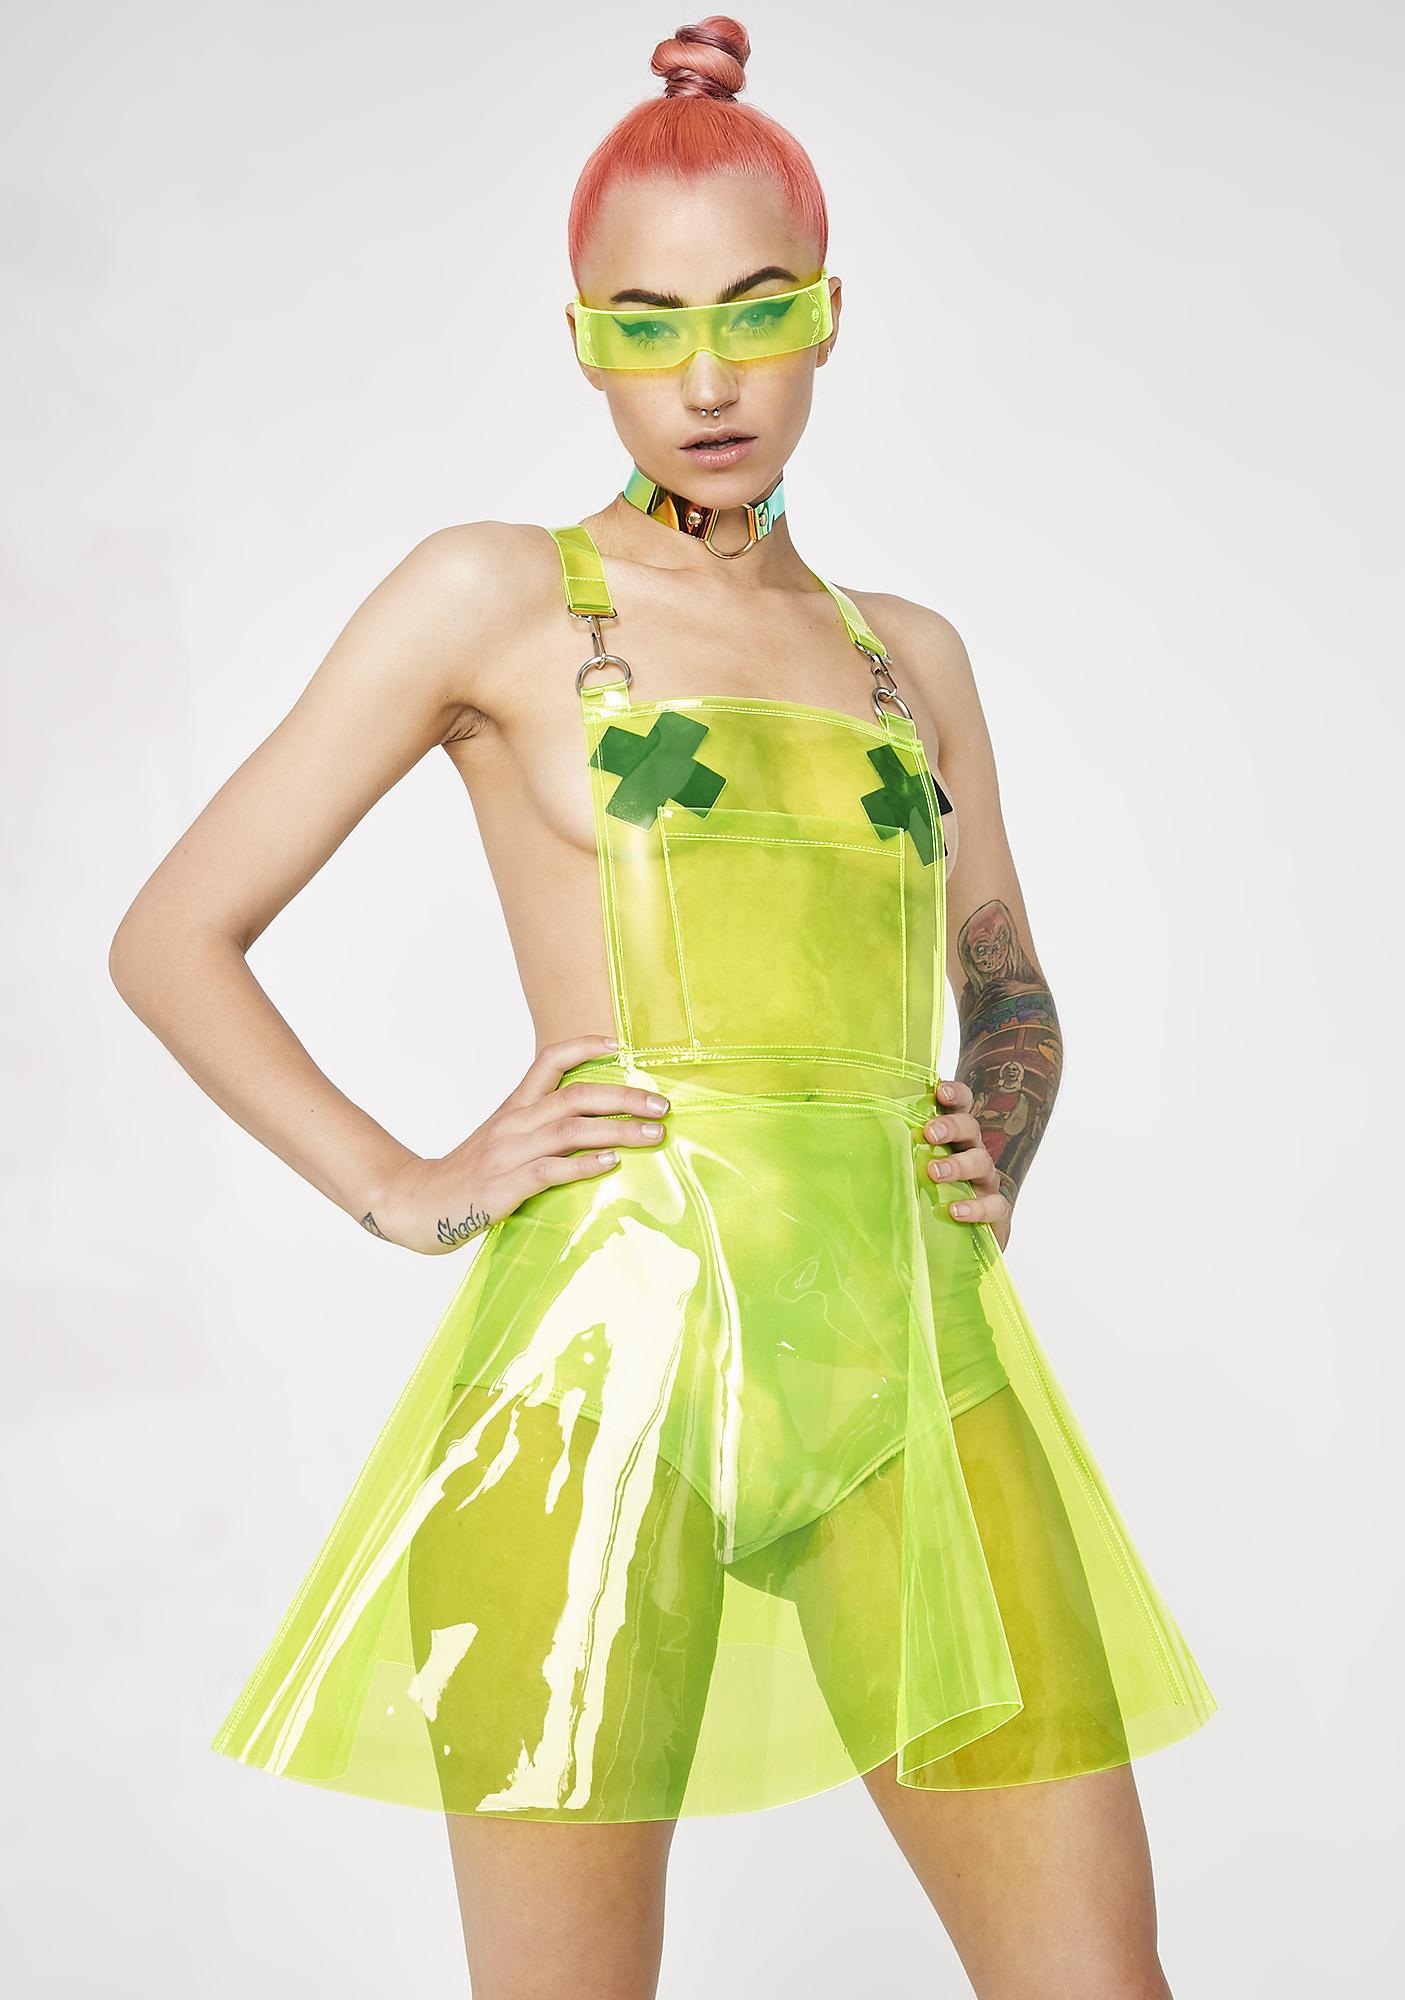 Club Exx Go Gurl Green Overall Dress